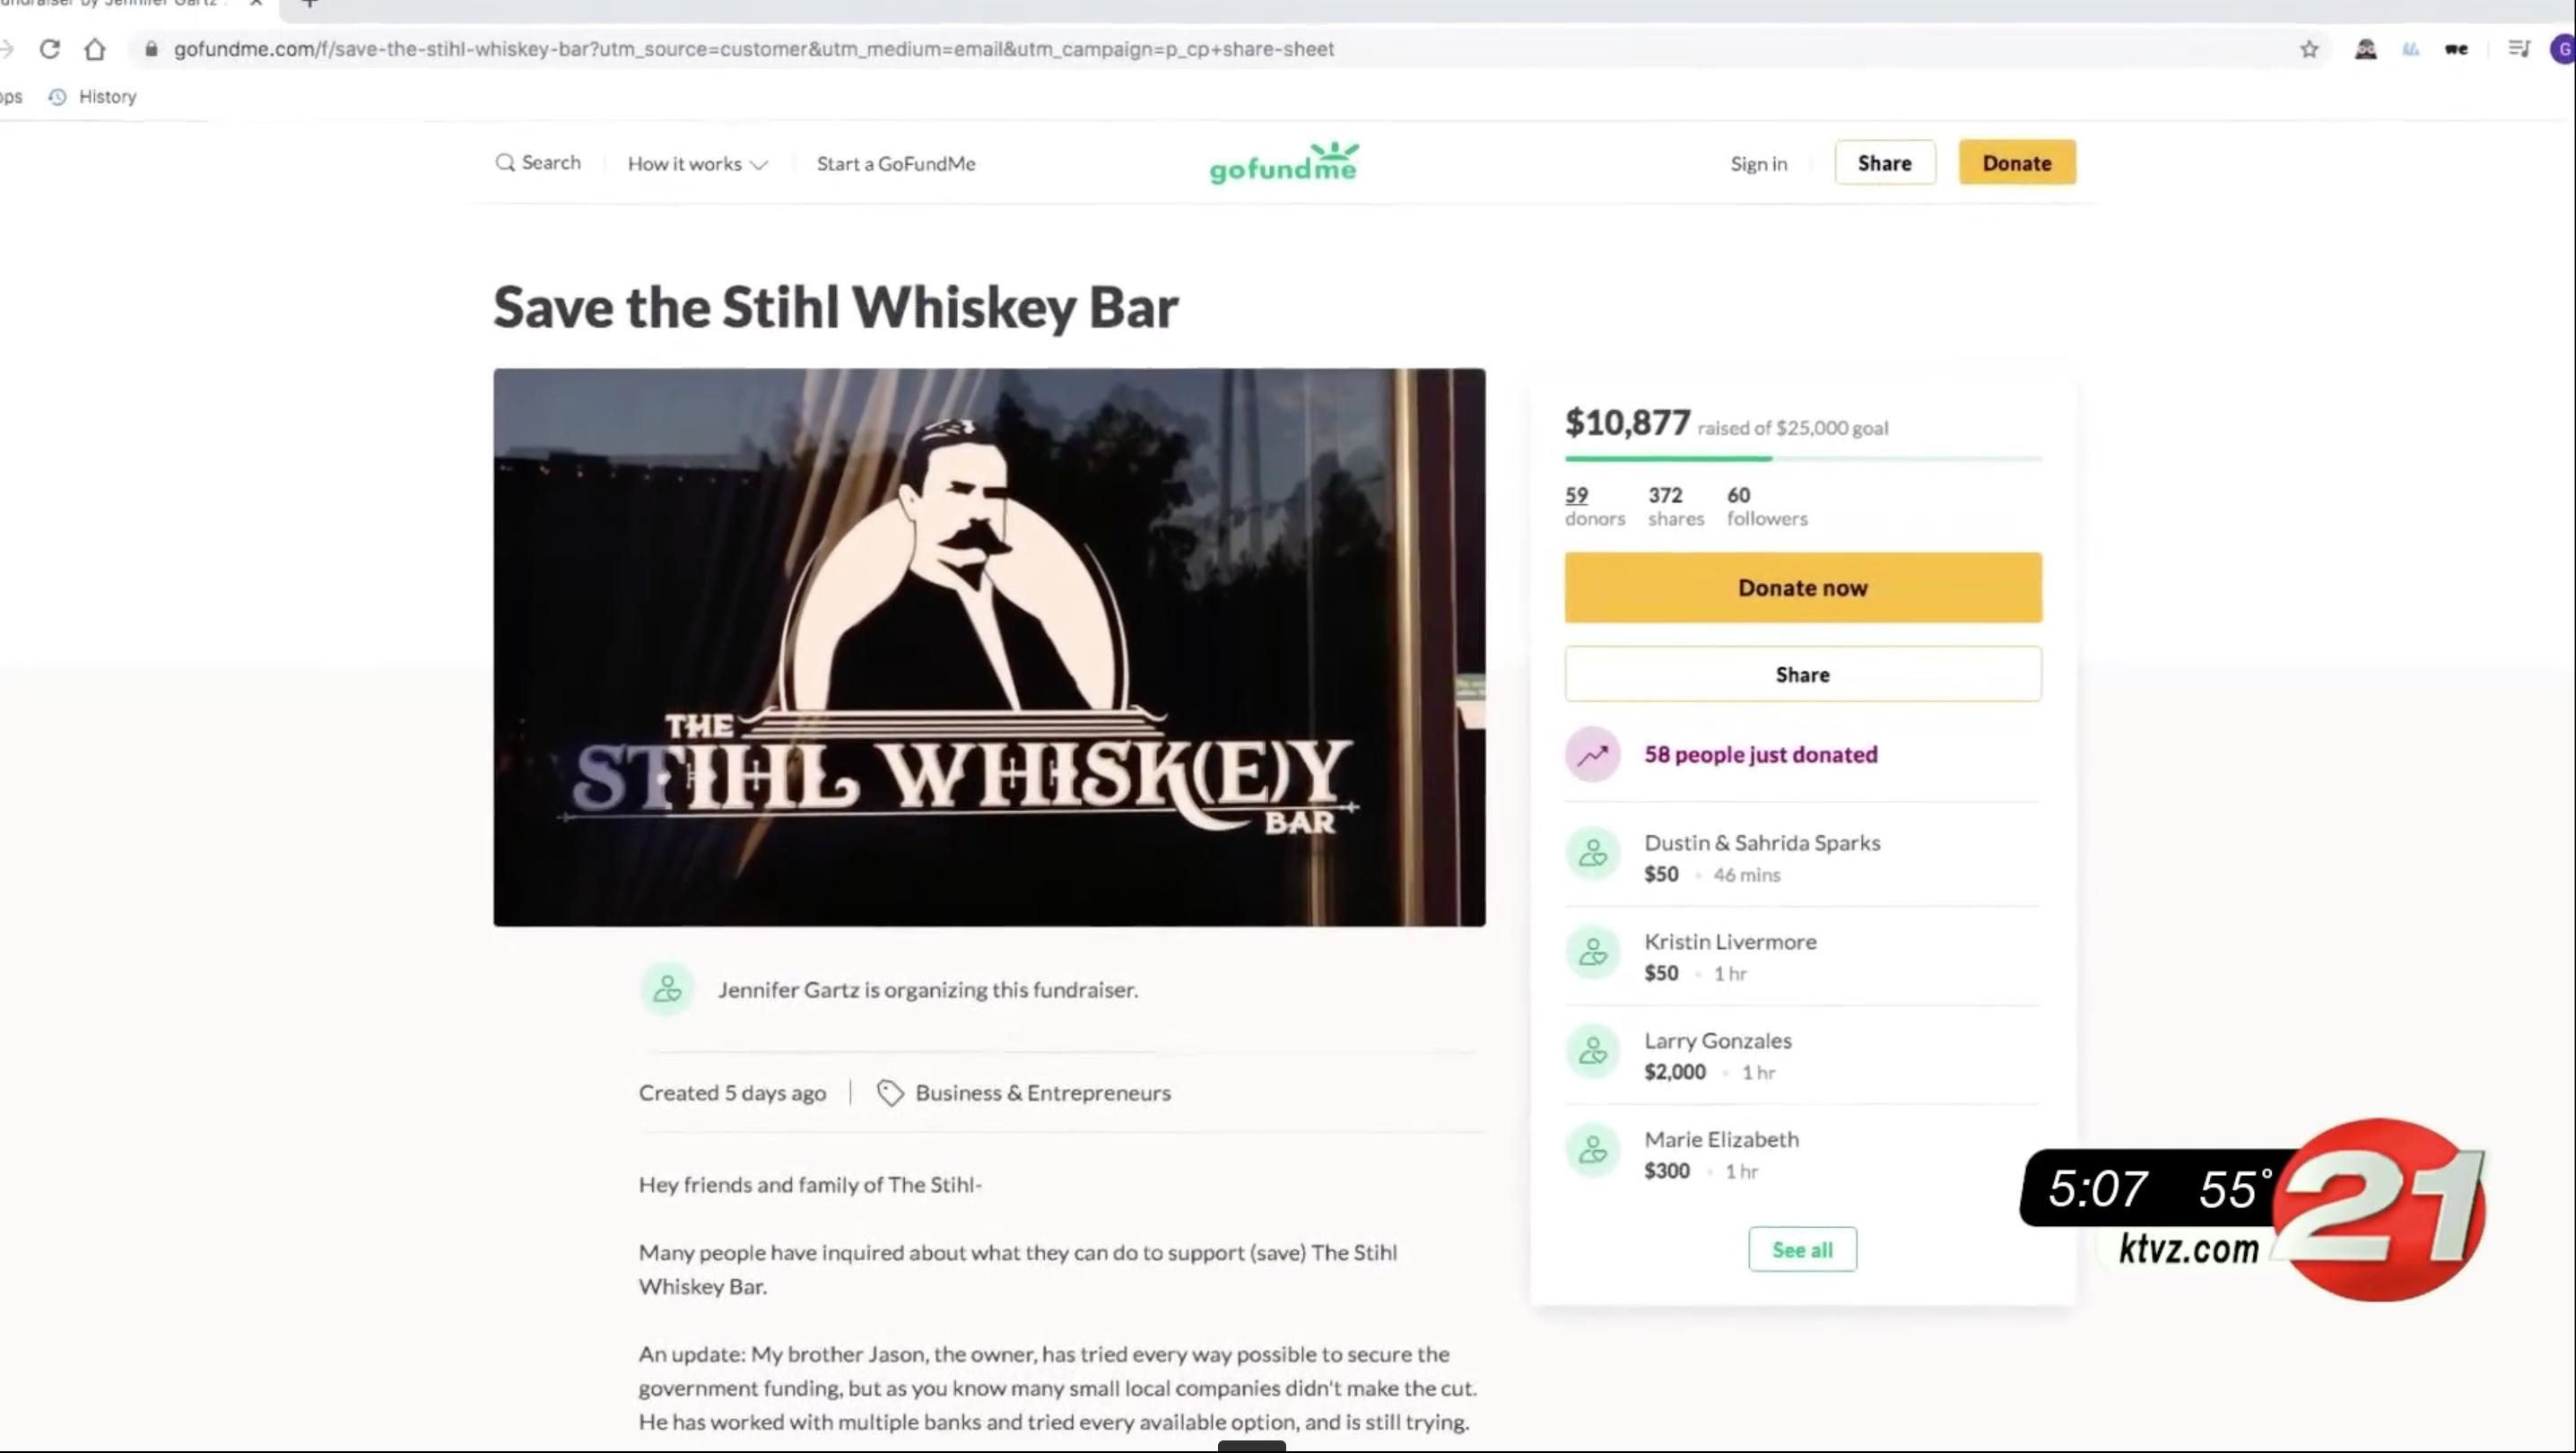 stihl whiskey gofundme